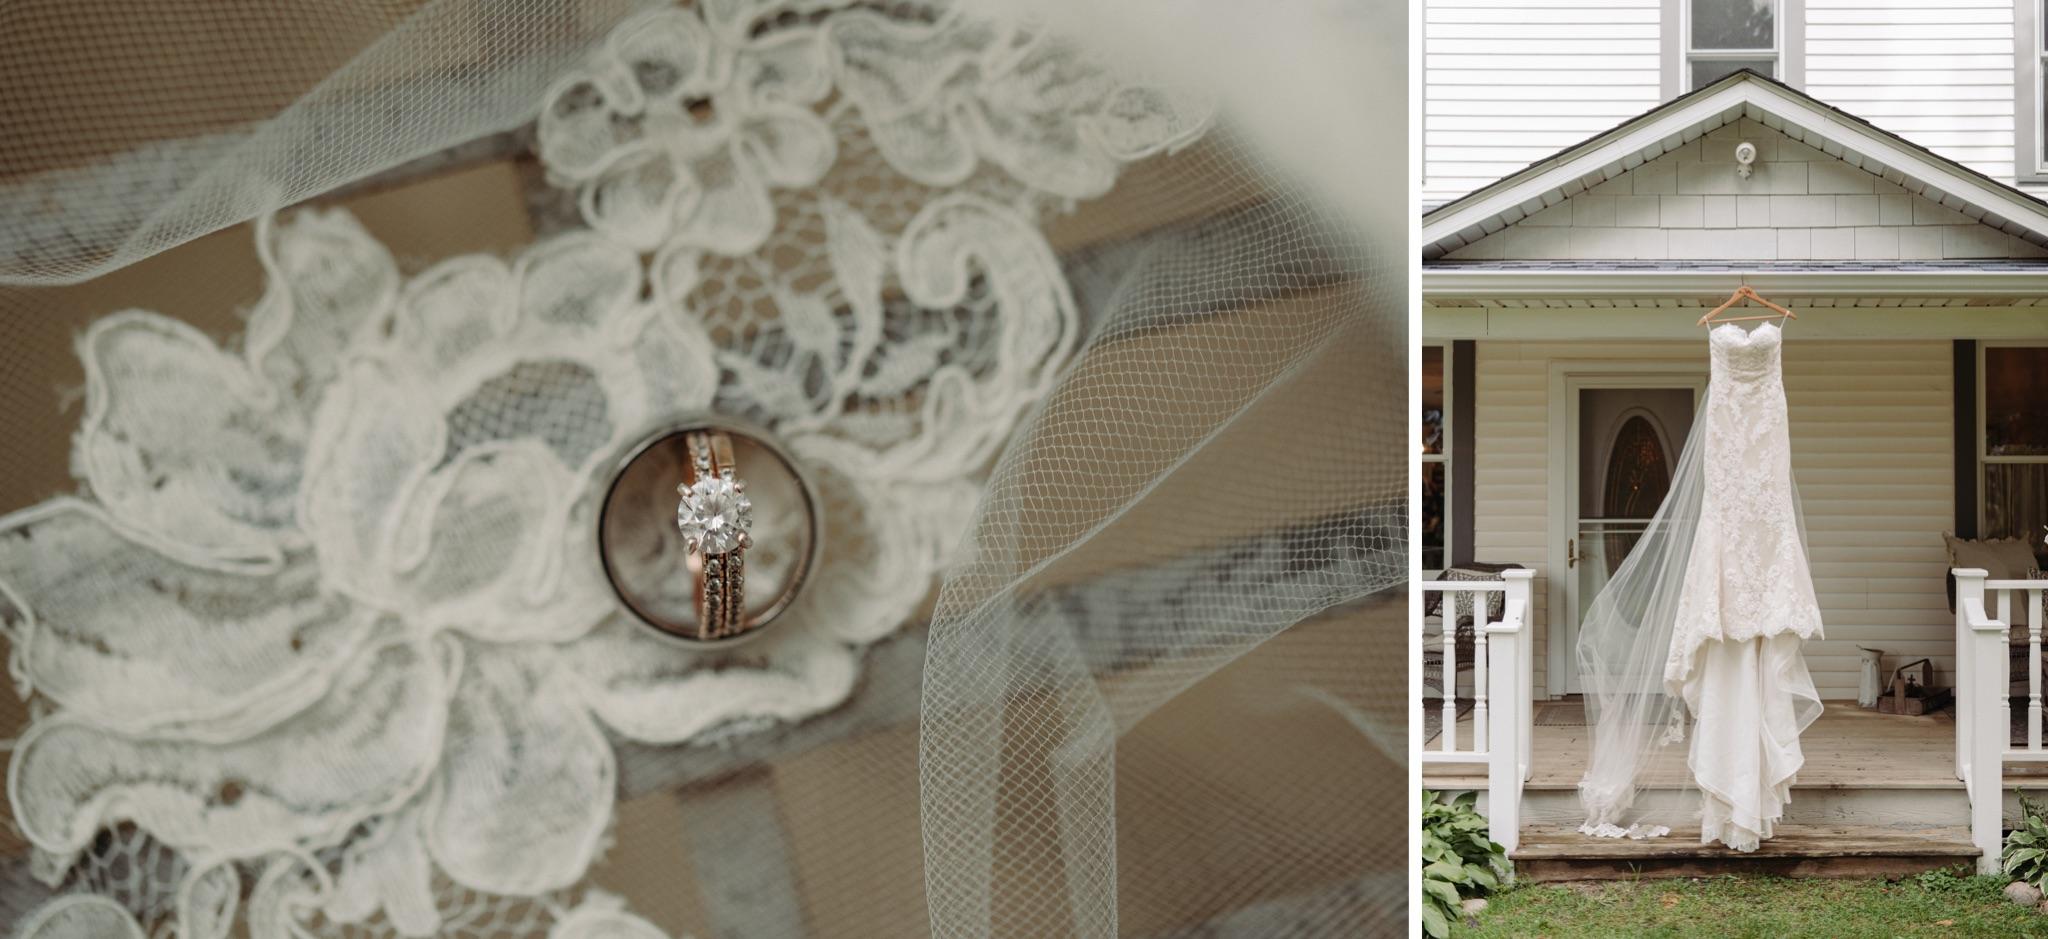 wedding dress hanging I'm front of house, wedding ring on lace